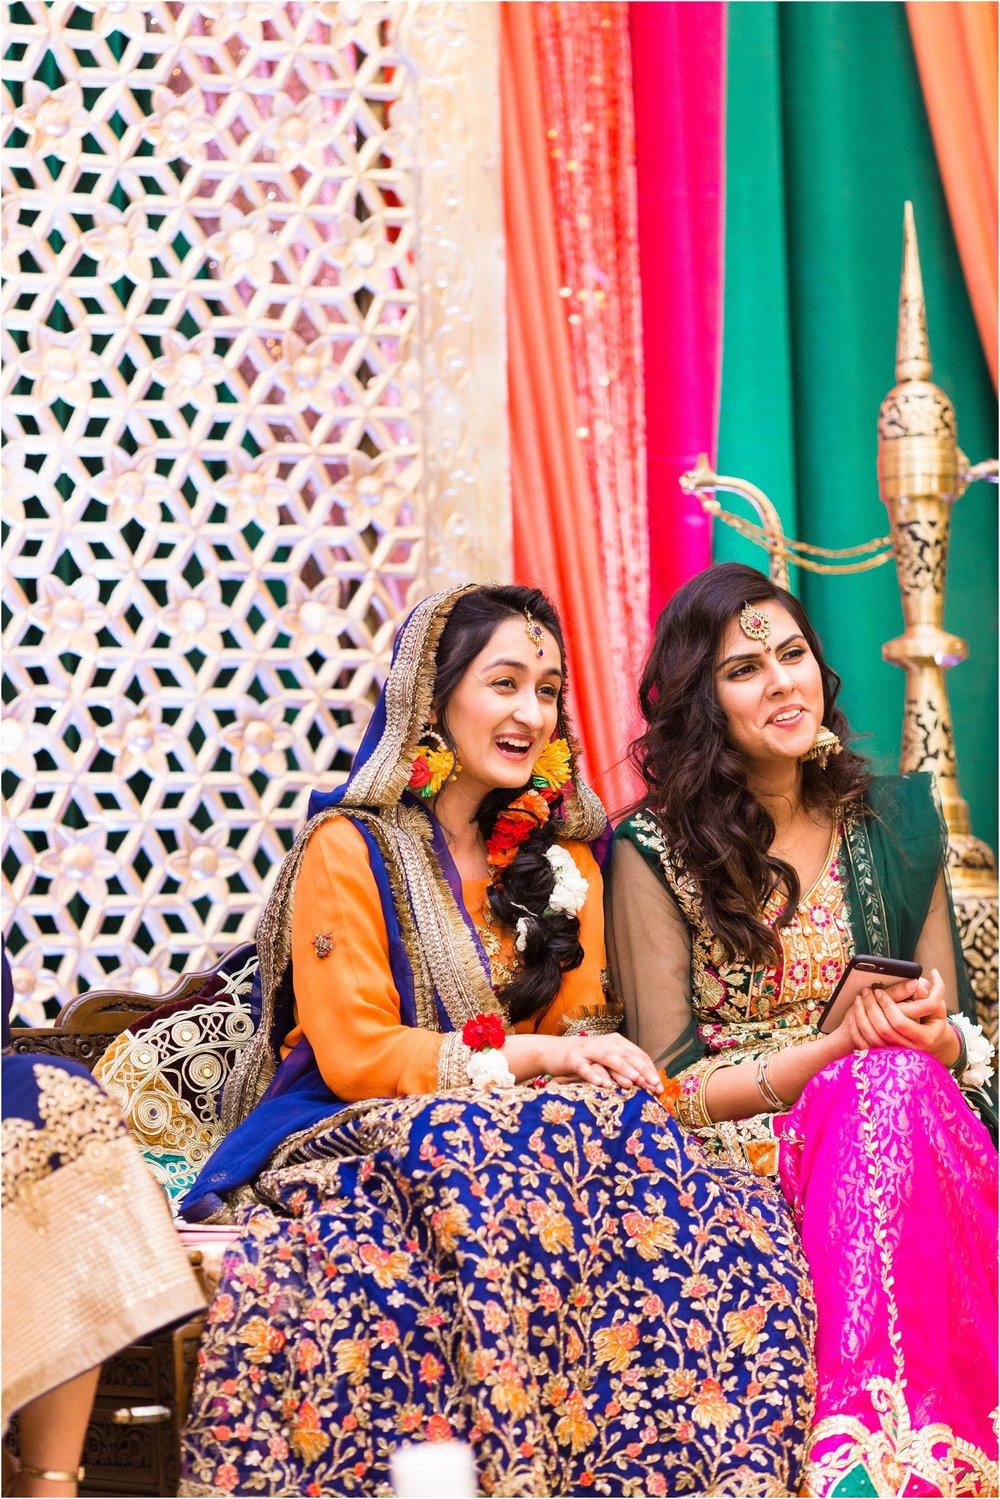 Mehndi-Markham-Convention-Centre-Toronto-Mississauga-Brampton-Scarborough-GTA-Pakistani-Indian-Wedding-Engagement-Photographer-Photography_0024.jpg